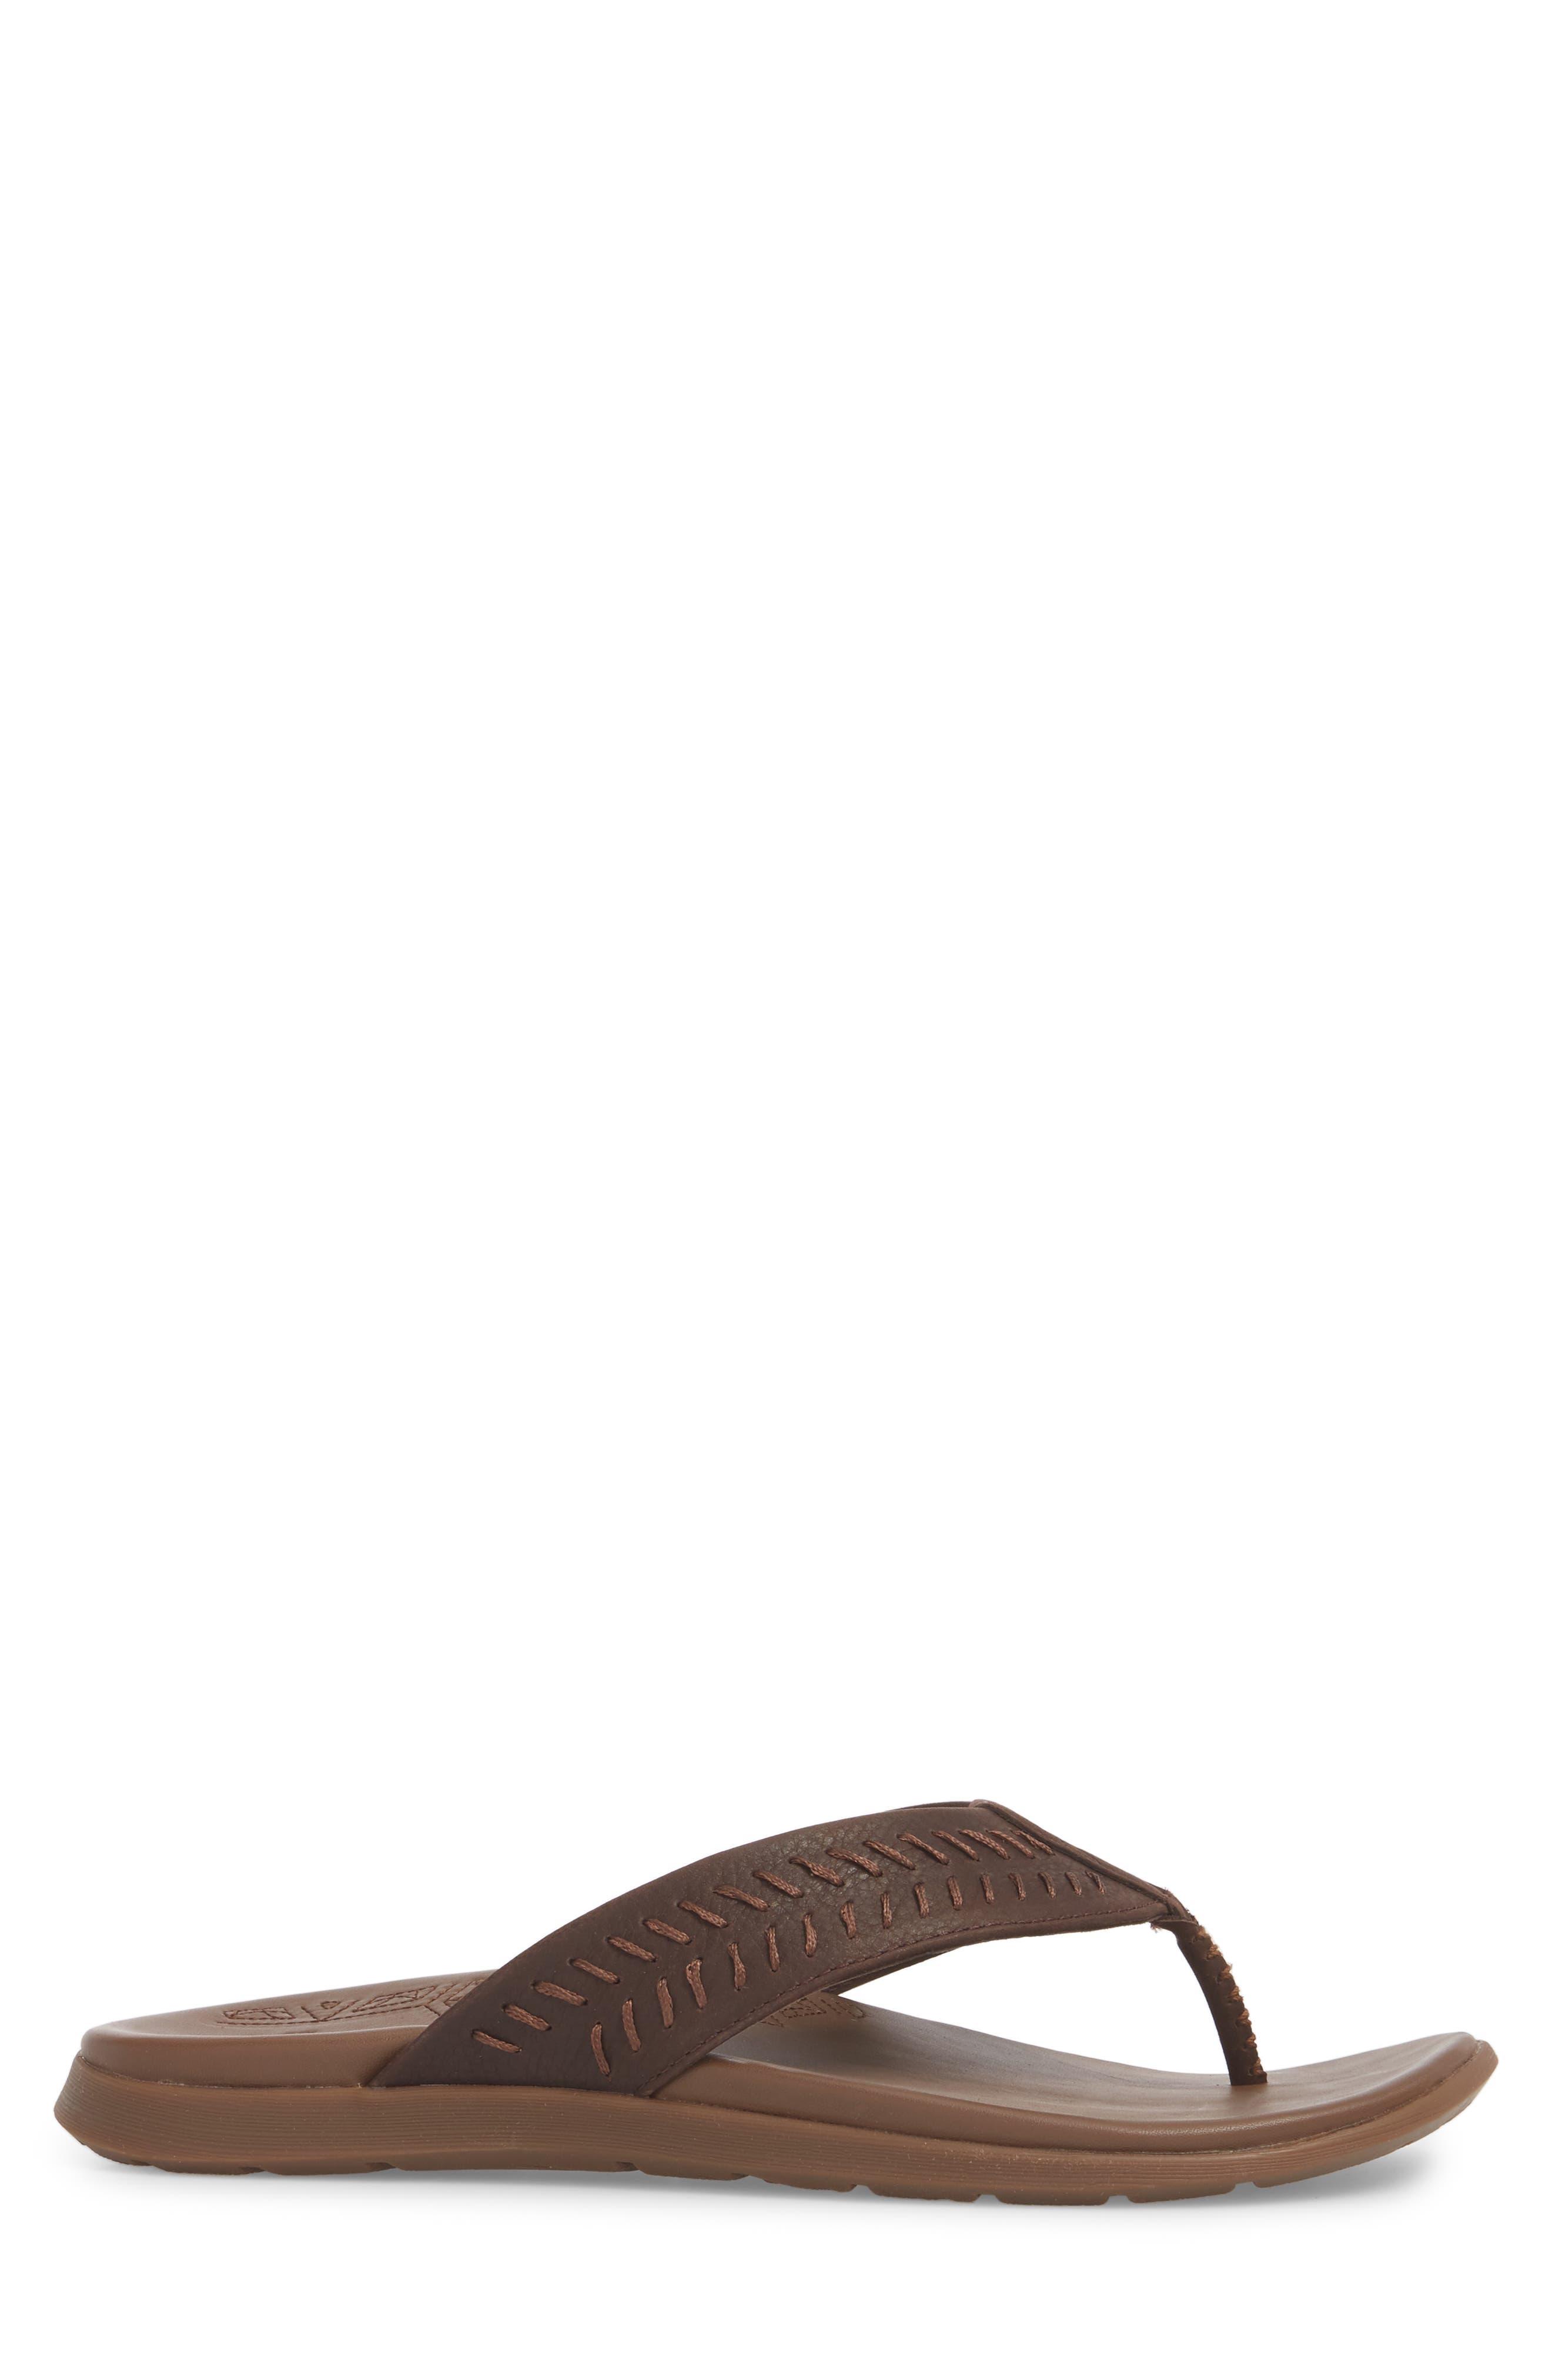 Jackson Flip Flop,                             Alternate thumbnail 3, color,                             Java Leather